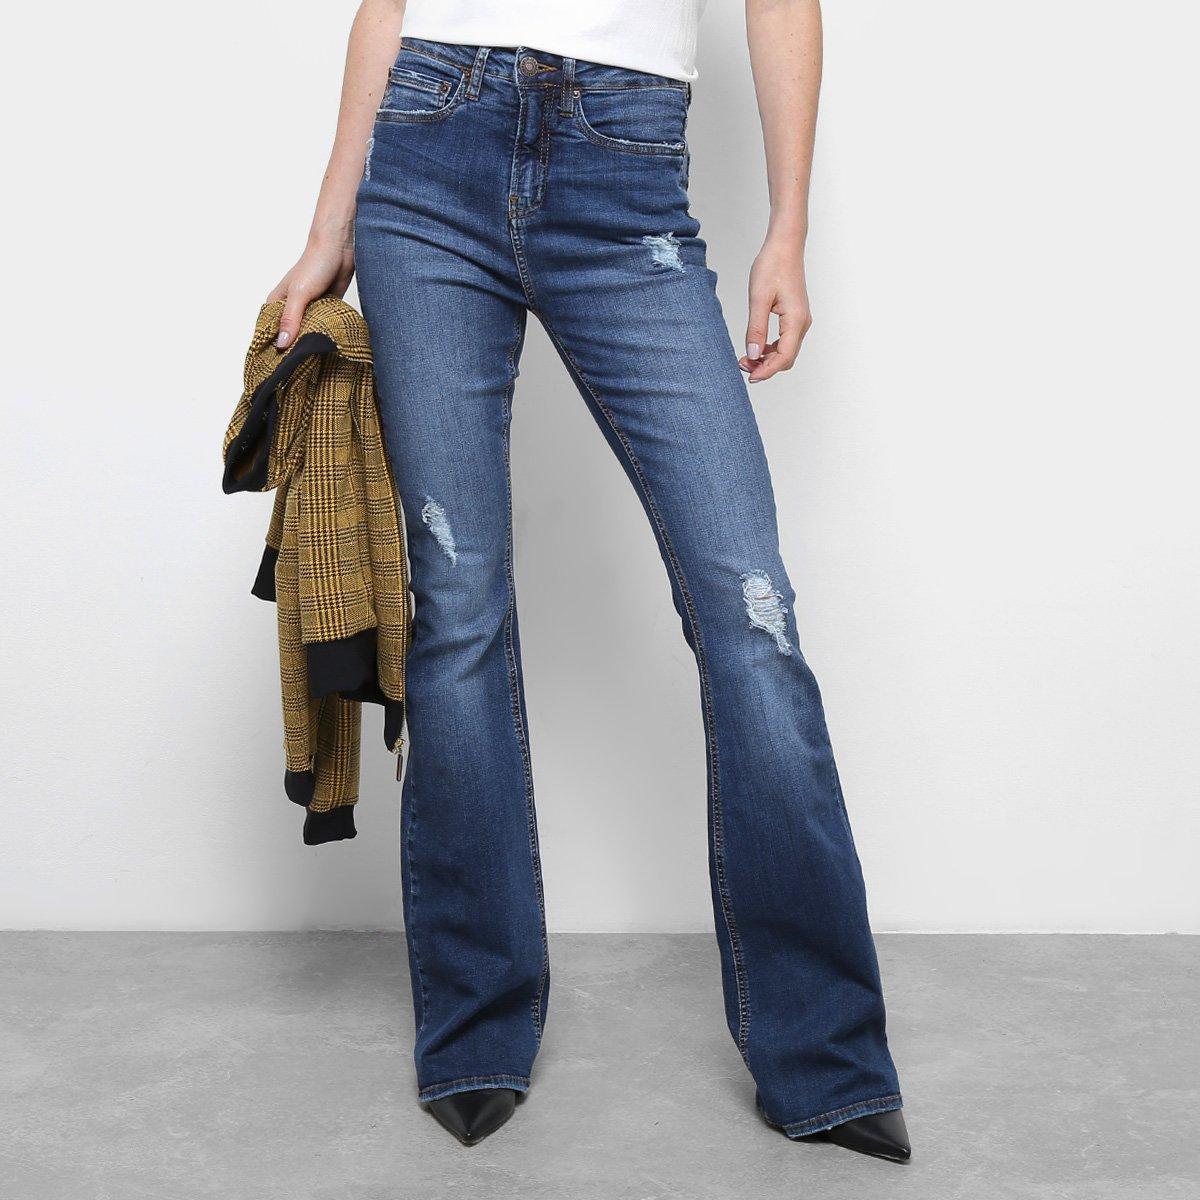 c107da278 Calça Jeans Flare Calvin Klein Five Pockets Cintura Média Feminina